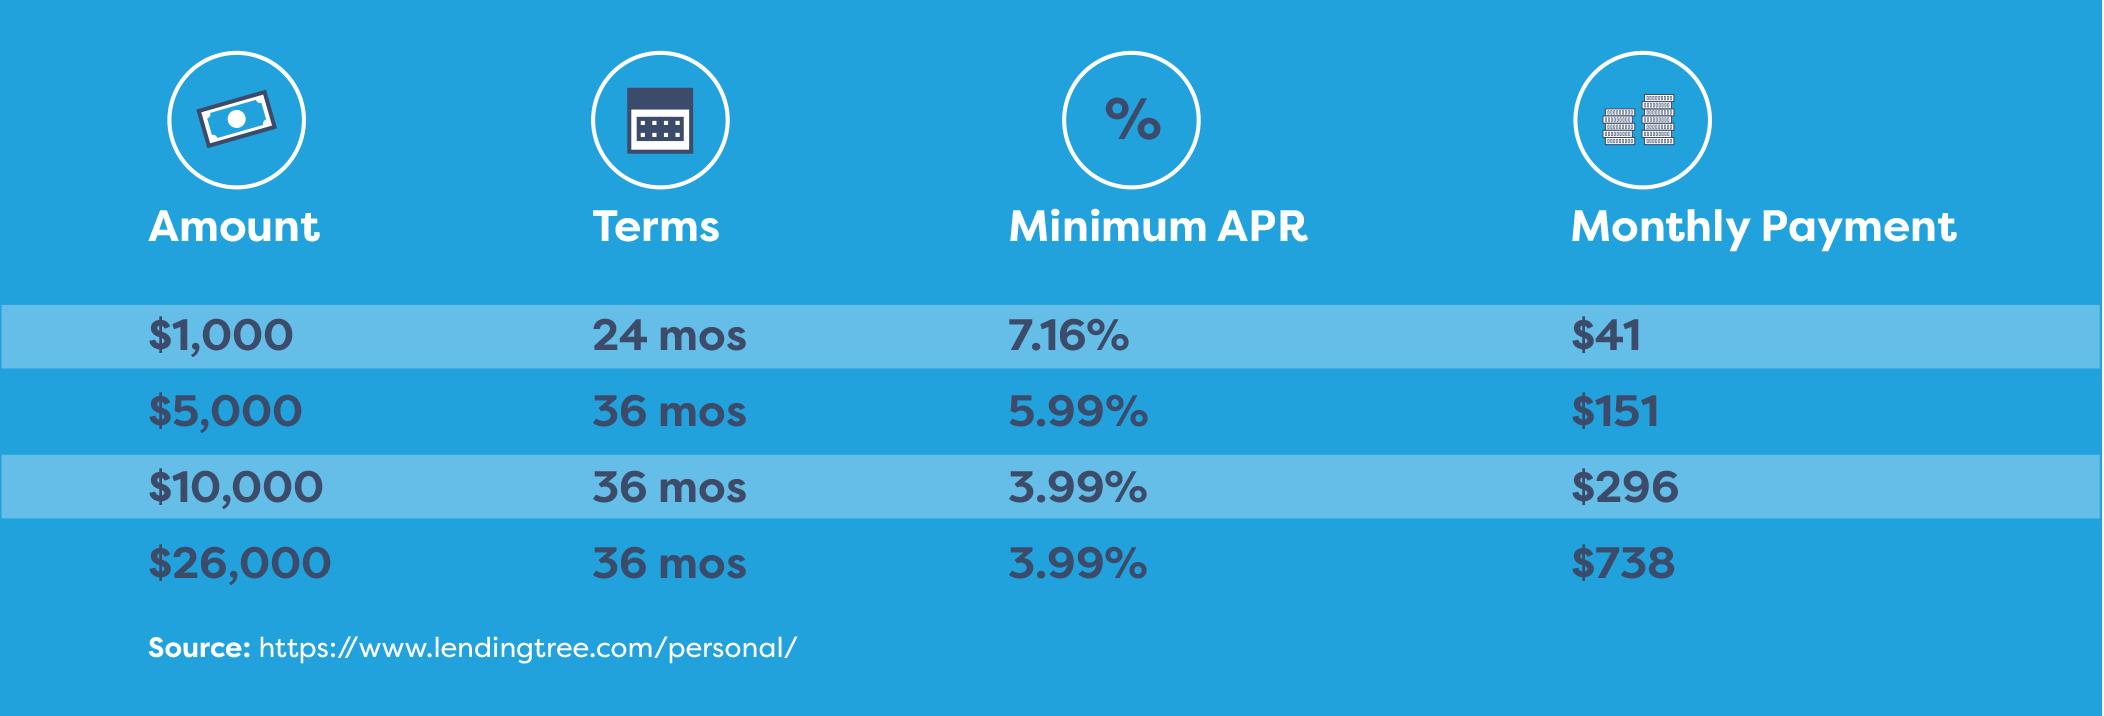 personal loan APRs